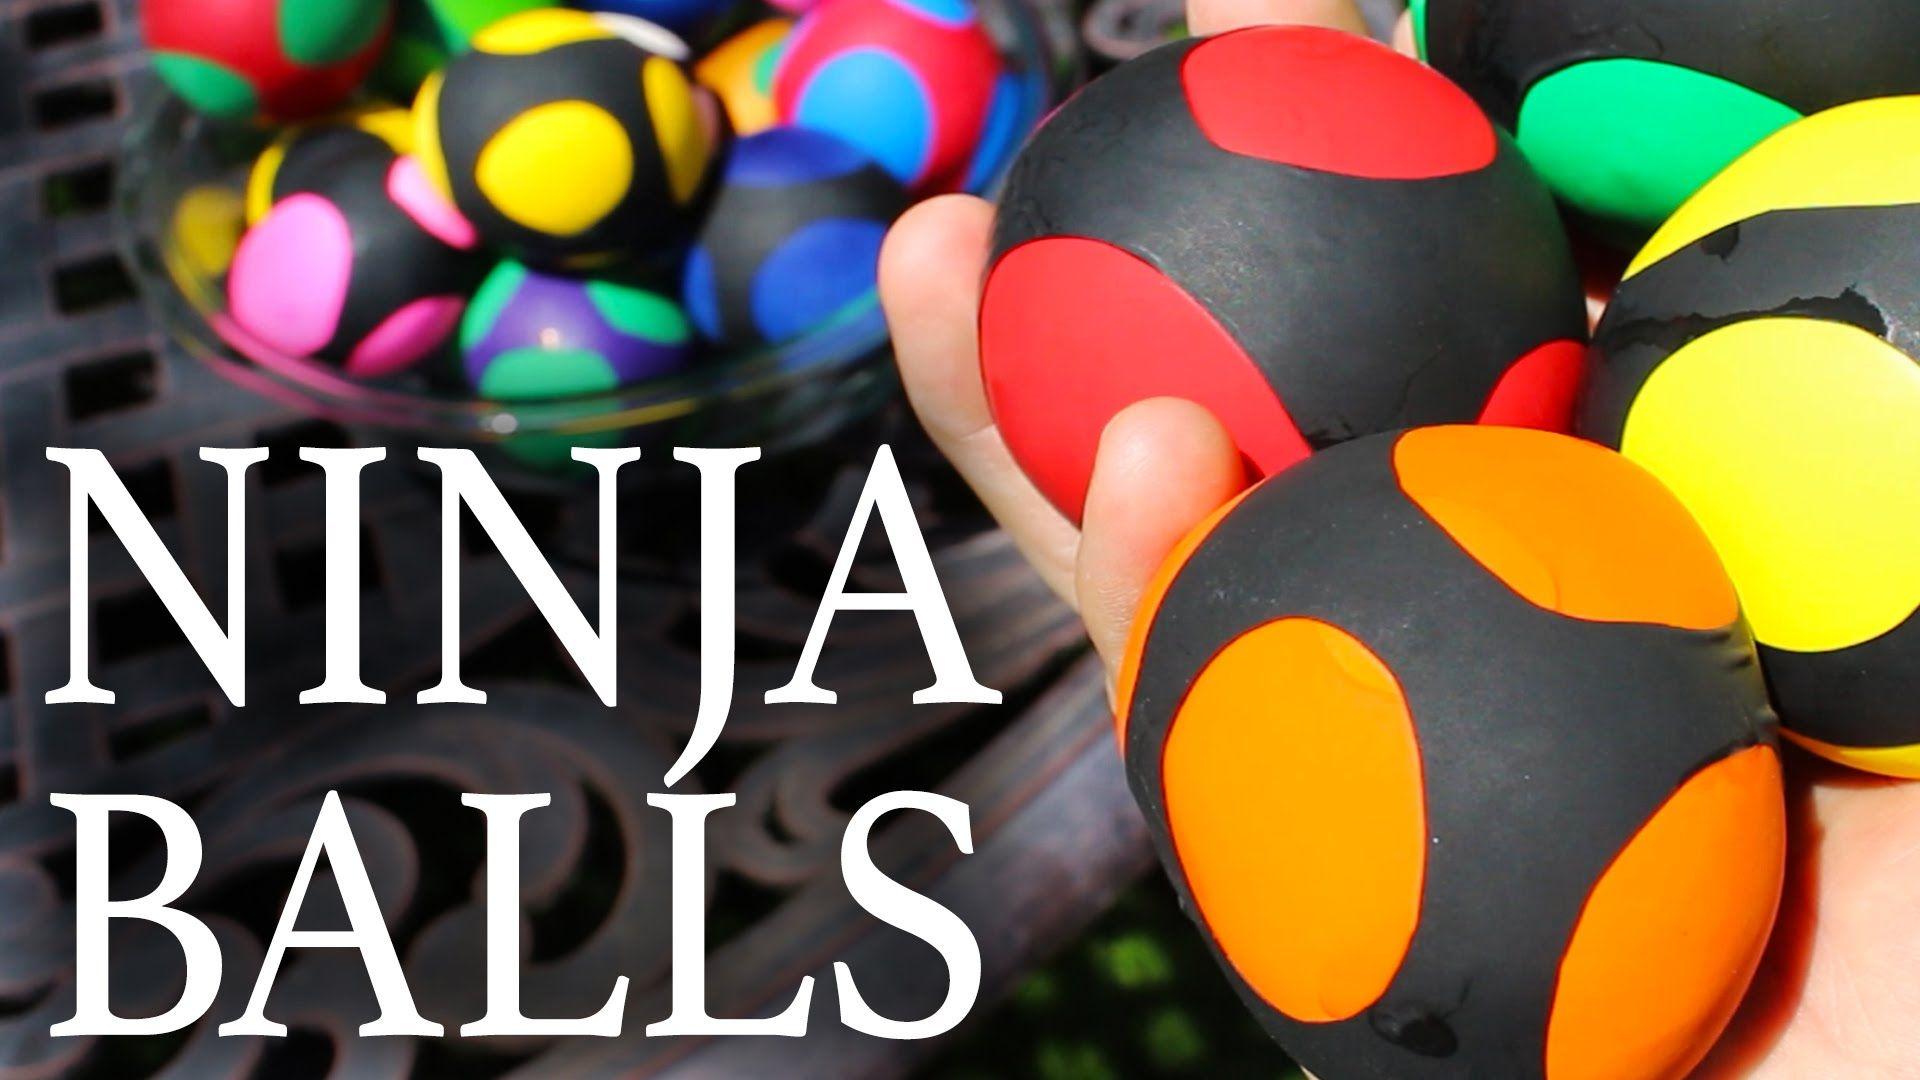 Call them Yoshi eggs Stress balls or Ninja Turtle squishies